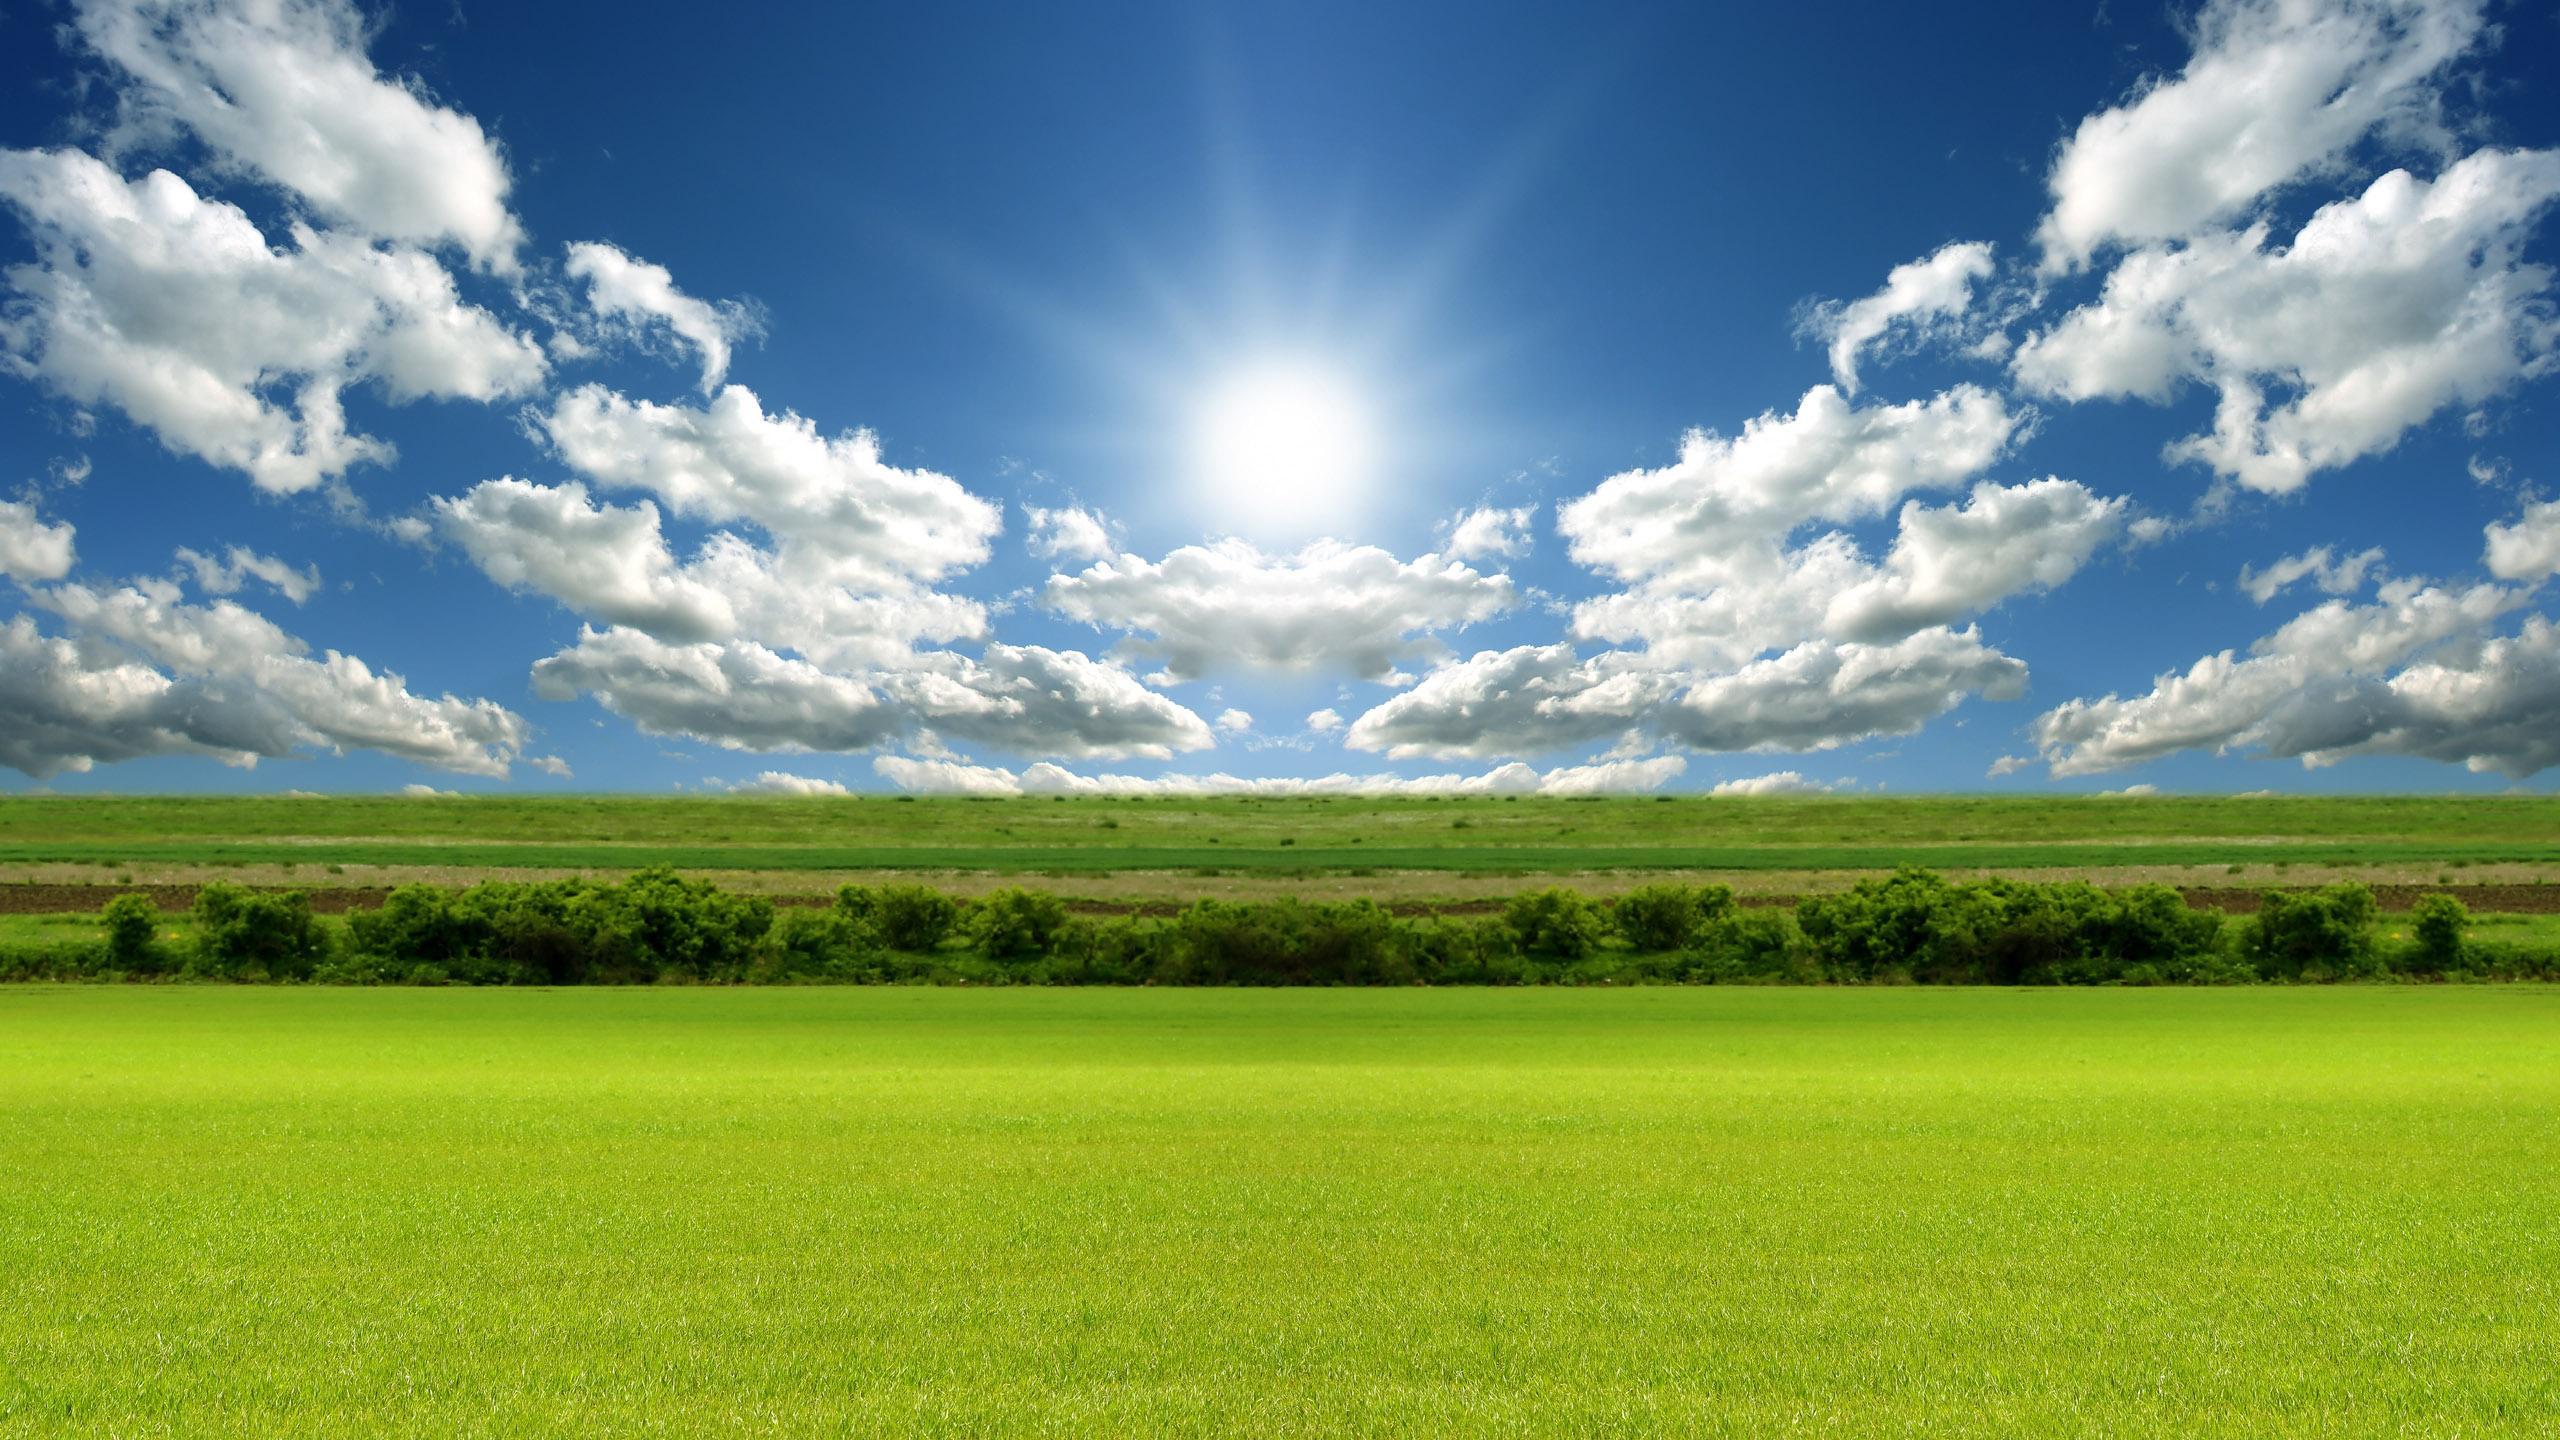 download Beautiful sunny day HQ WALLPAPER 126348 [2560x1440 2560x1440